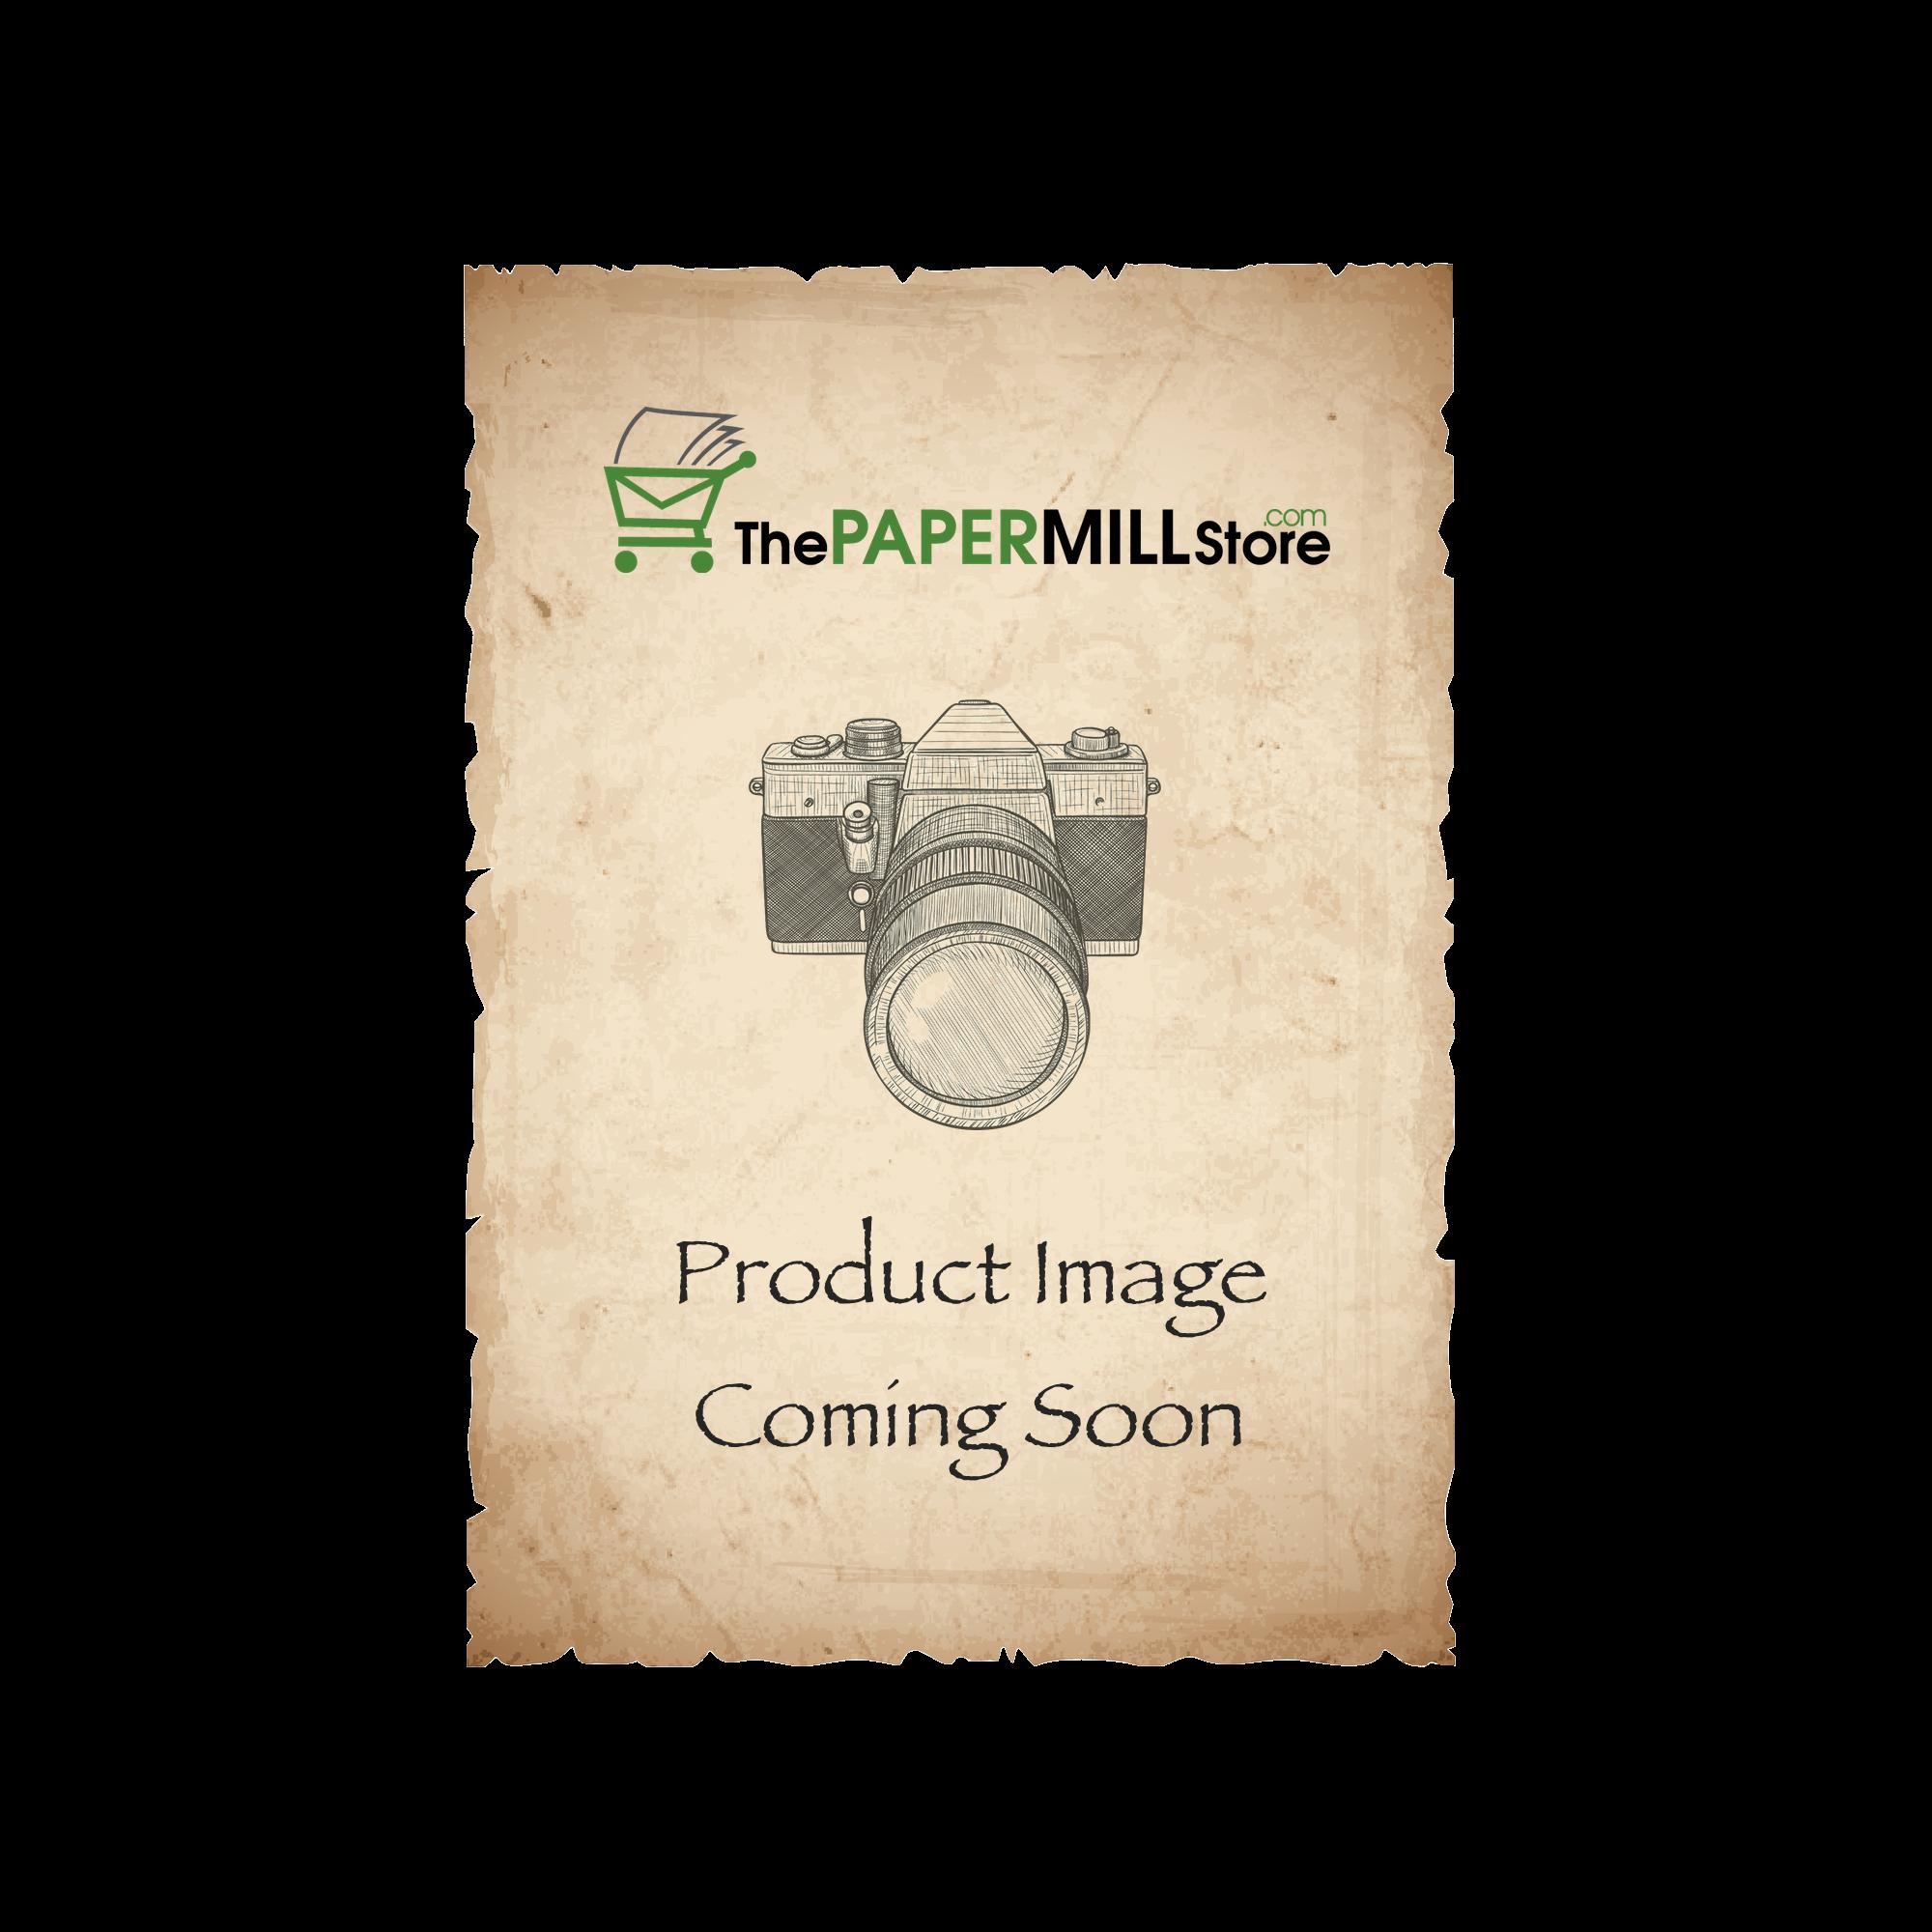 Loop Antique Vellum Iris Envelopes - A2 (4 3/8 x 5 3/4) 80 lb Text Antique Vellum  50% Recycled 250 per Box